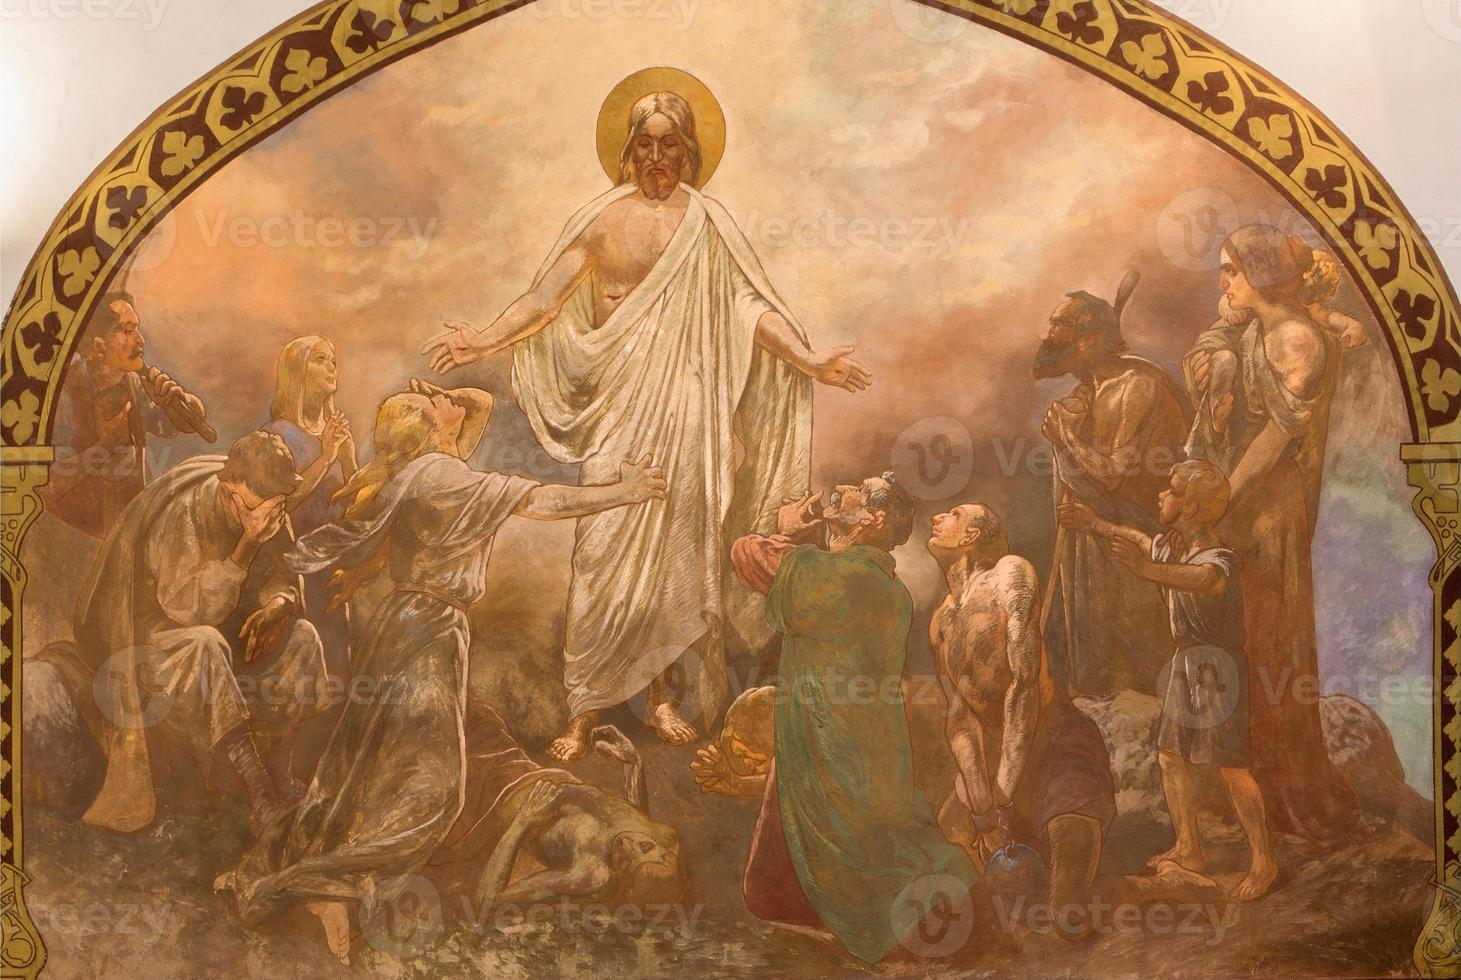 Banska Bela - The fresco of Christ healing photo